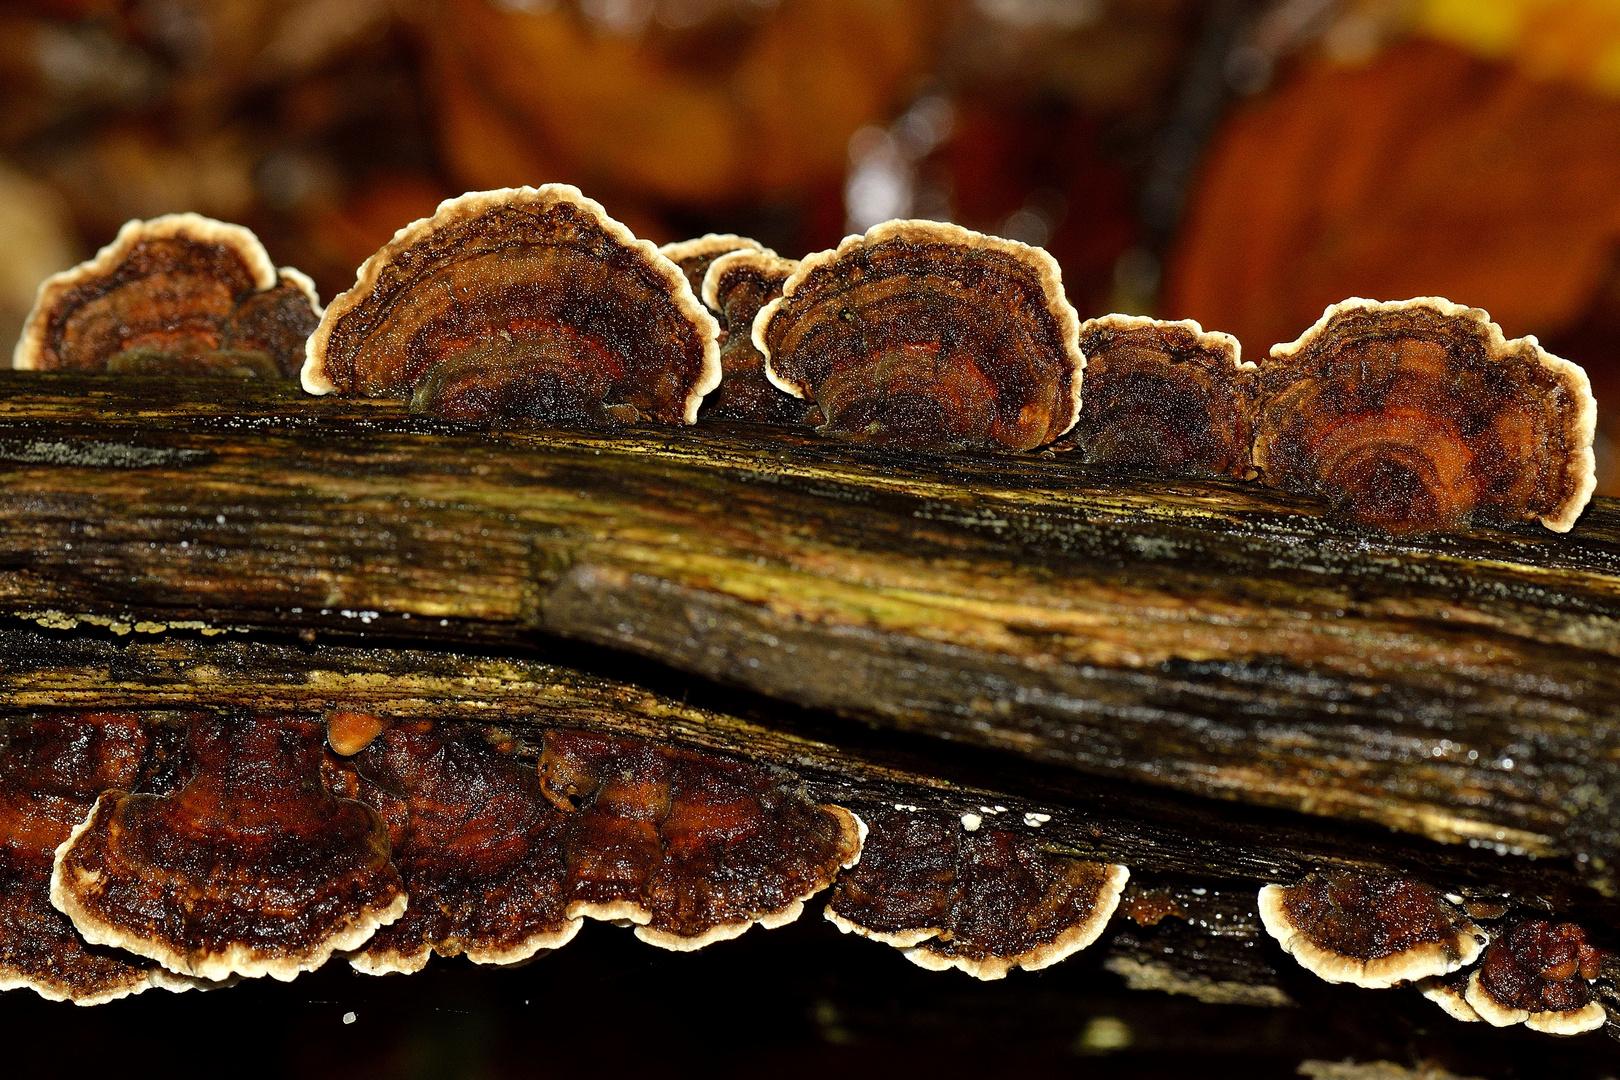 Baumpilz in Herbstfarben